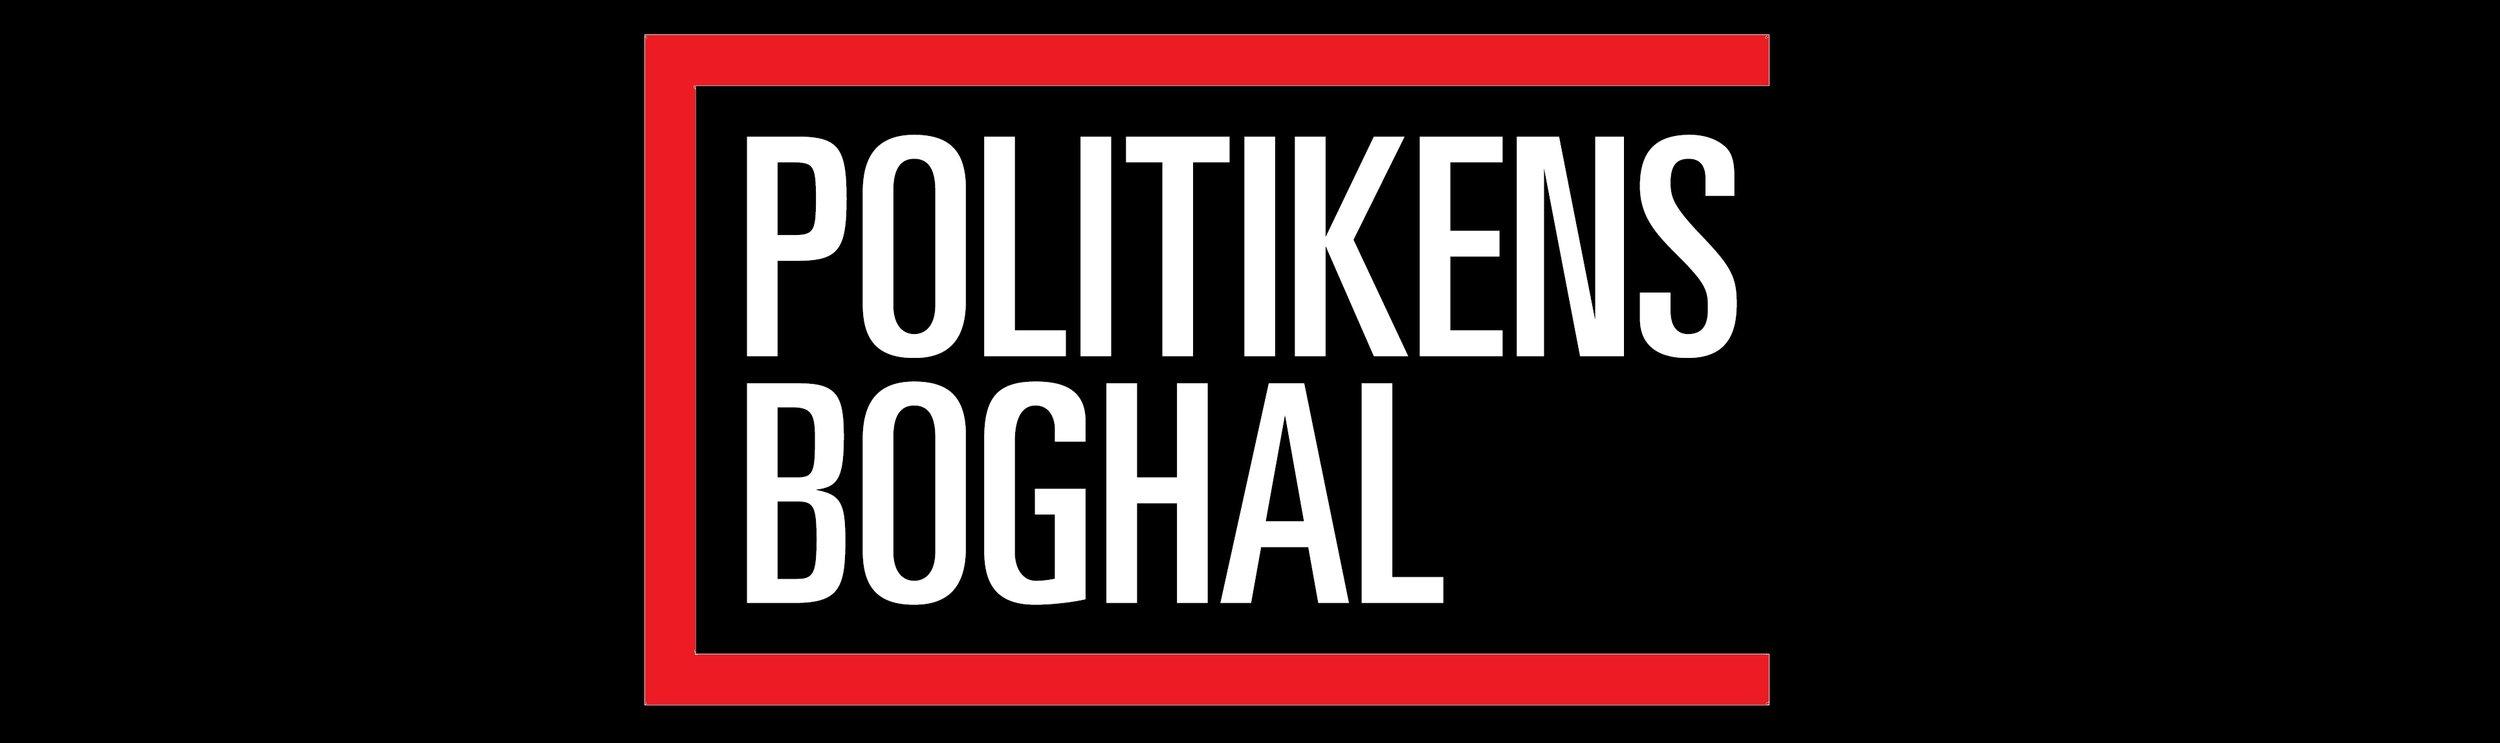 Politikens Boghal.jpg